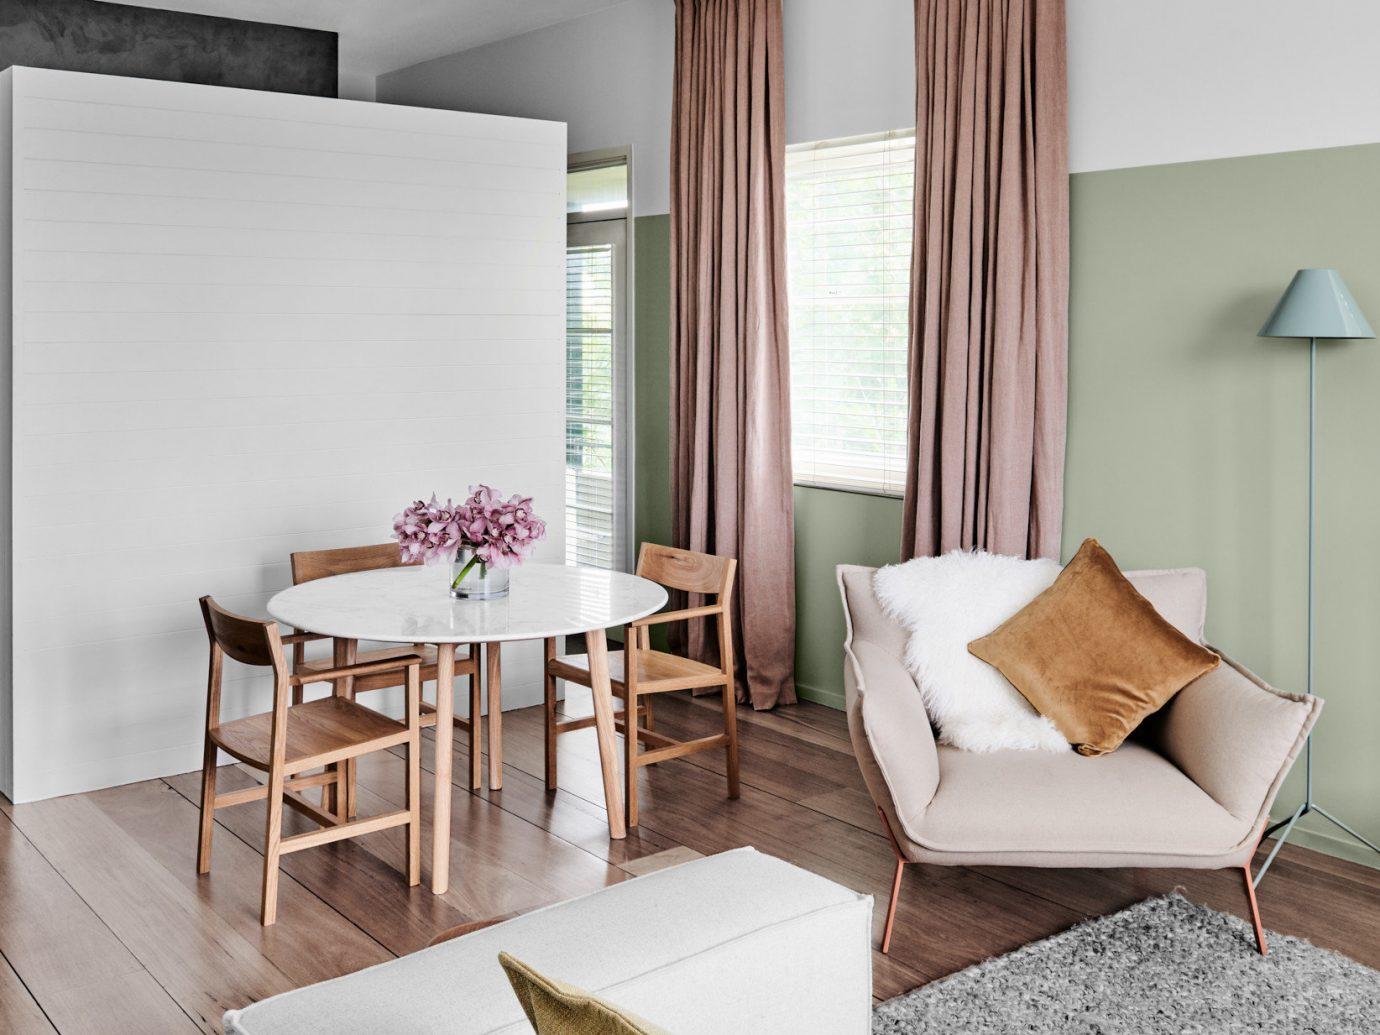 Australia Hotels Melbourne floor indoor room wall Living interior design table furniture living room product design interior designer Suite chair window area tan